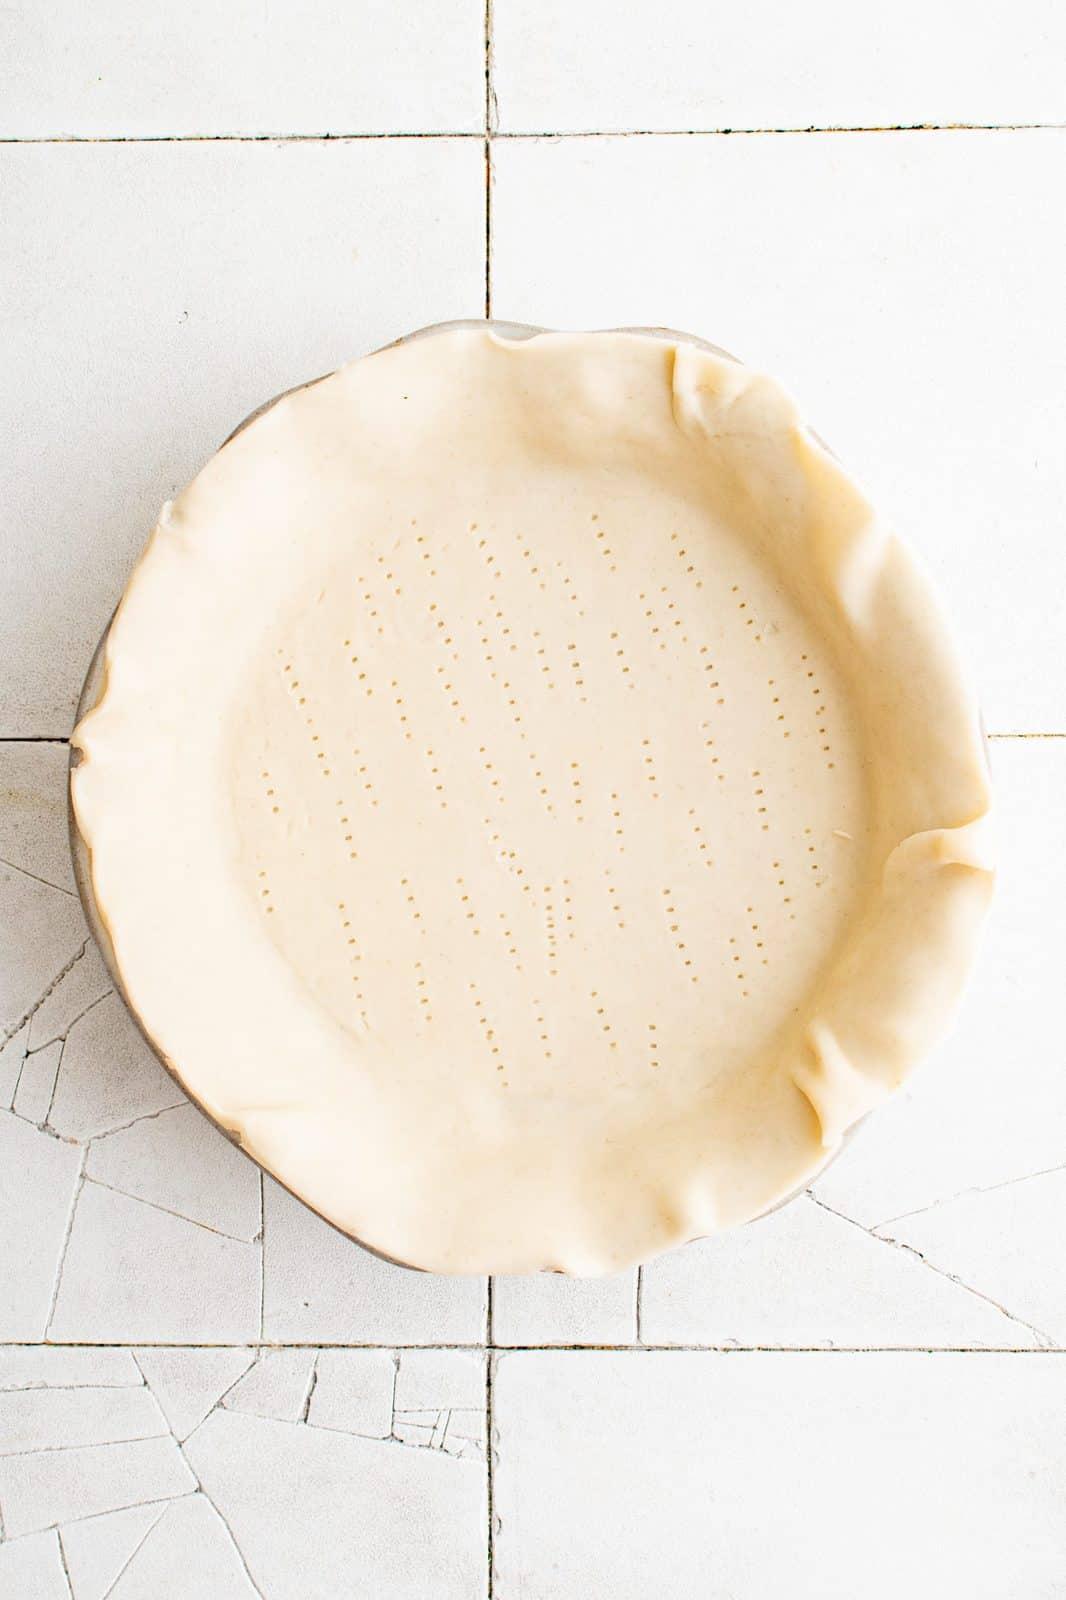 Pie crust in pie plate.